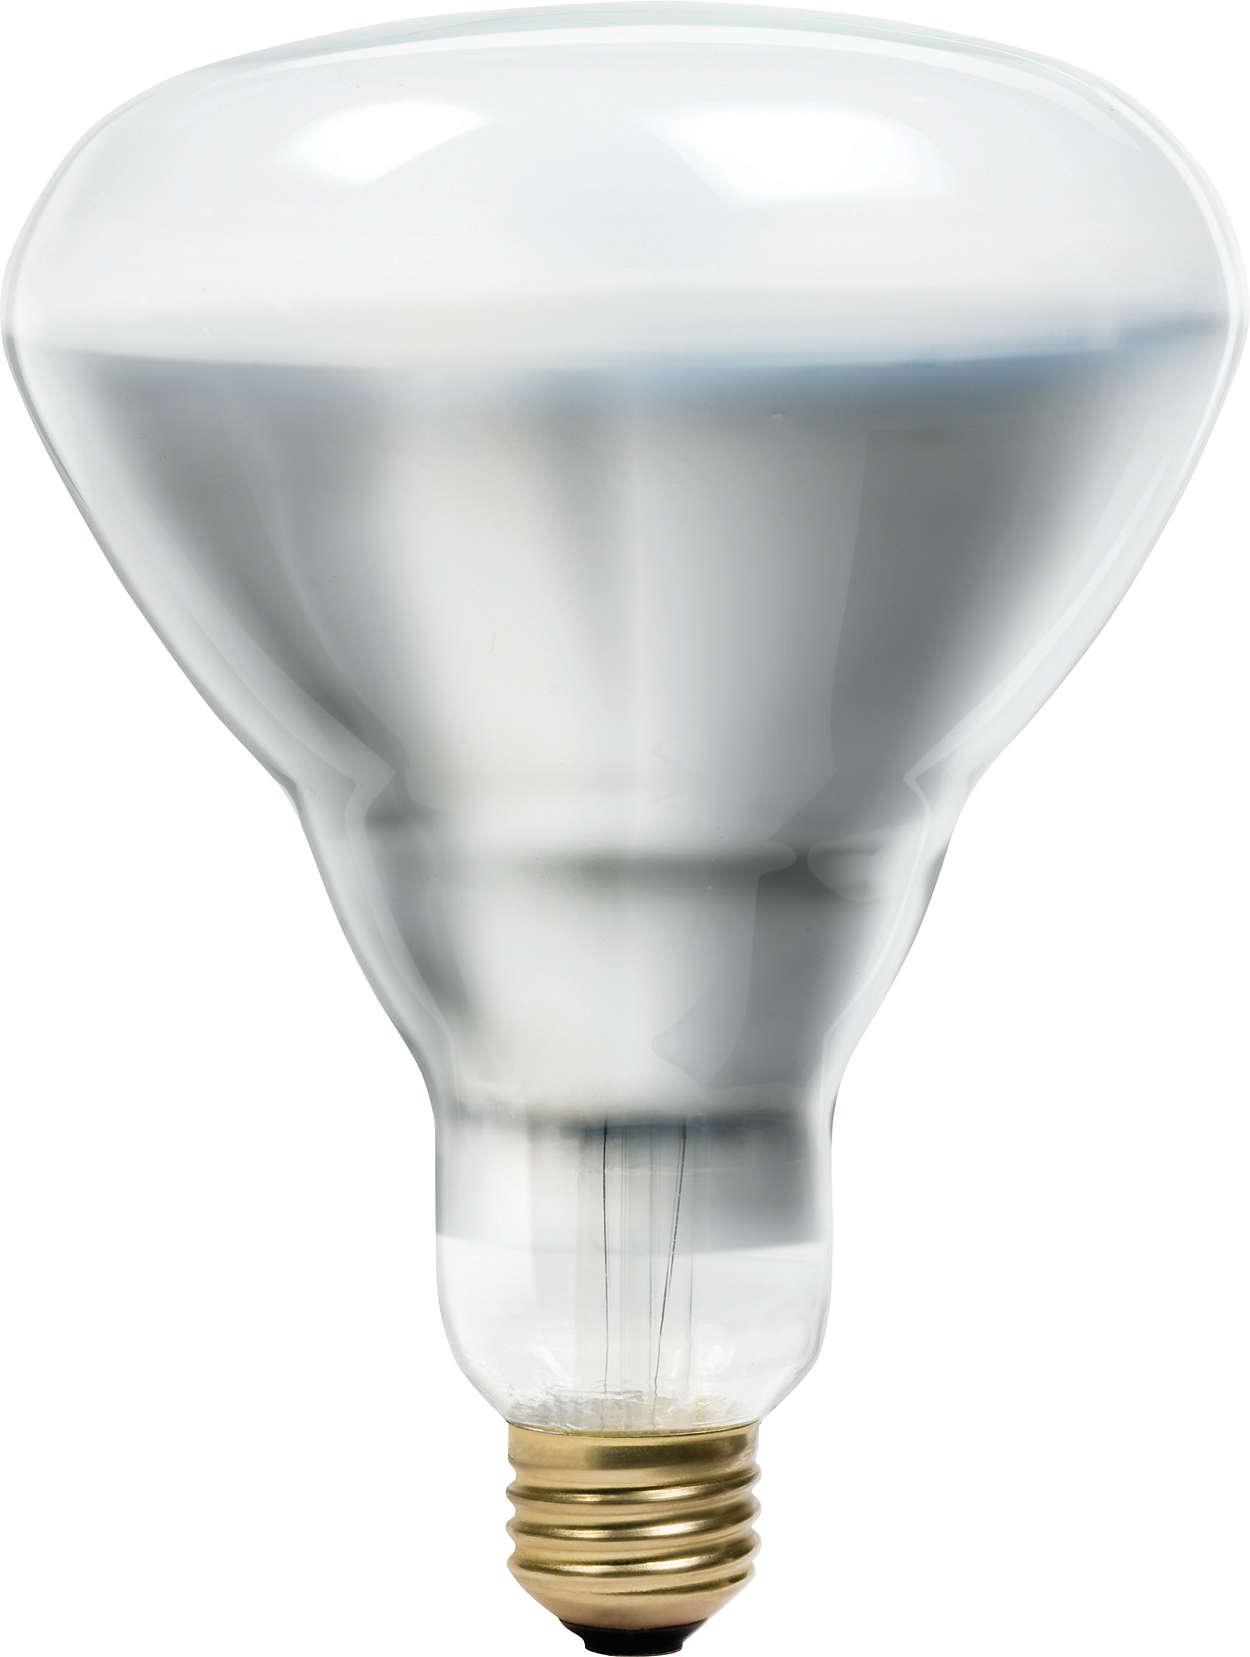 Energy savings without sacrifices